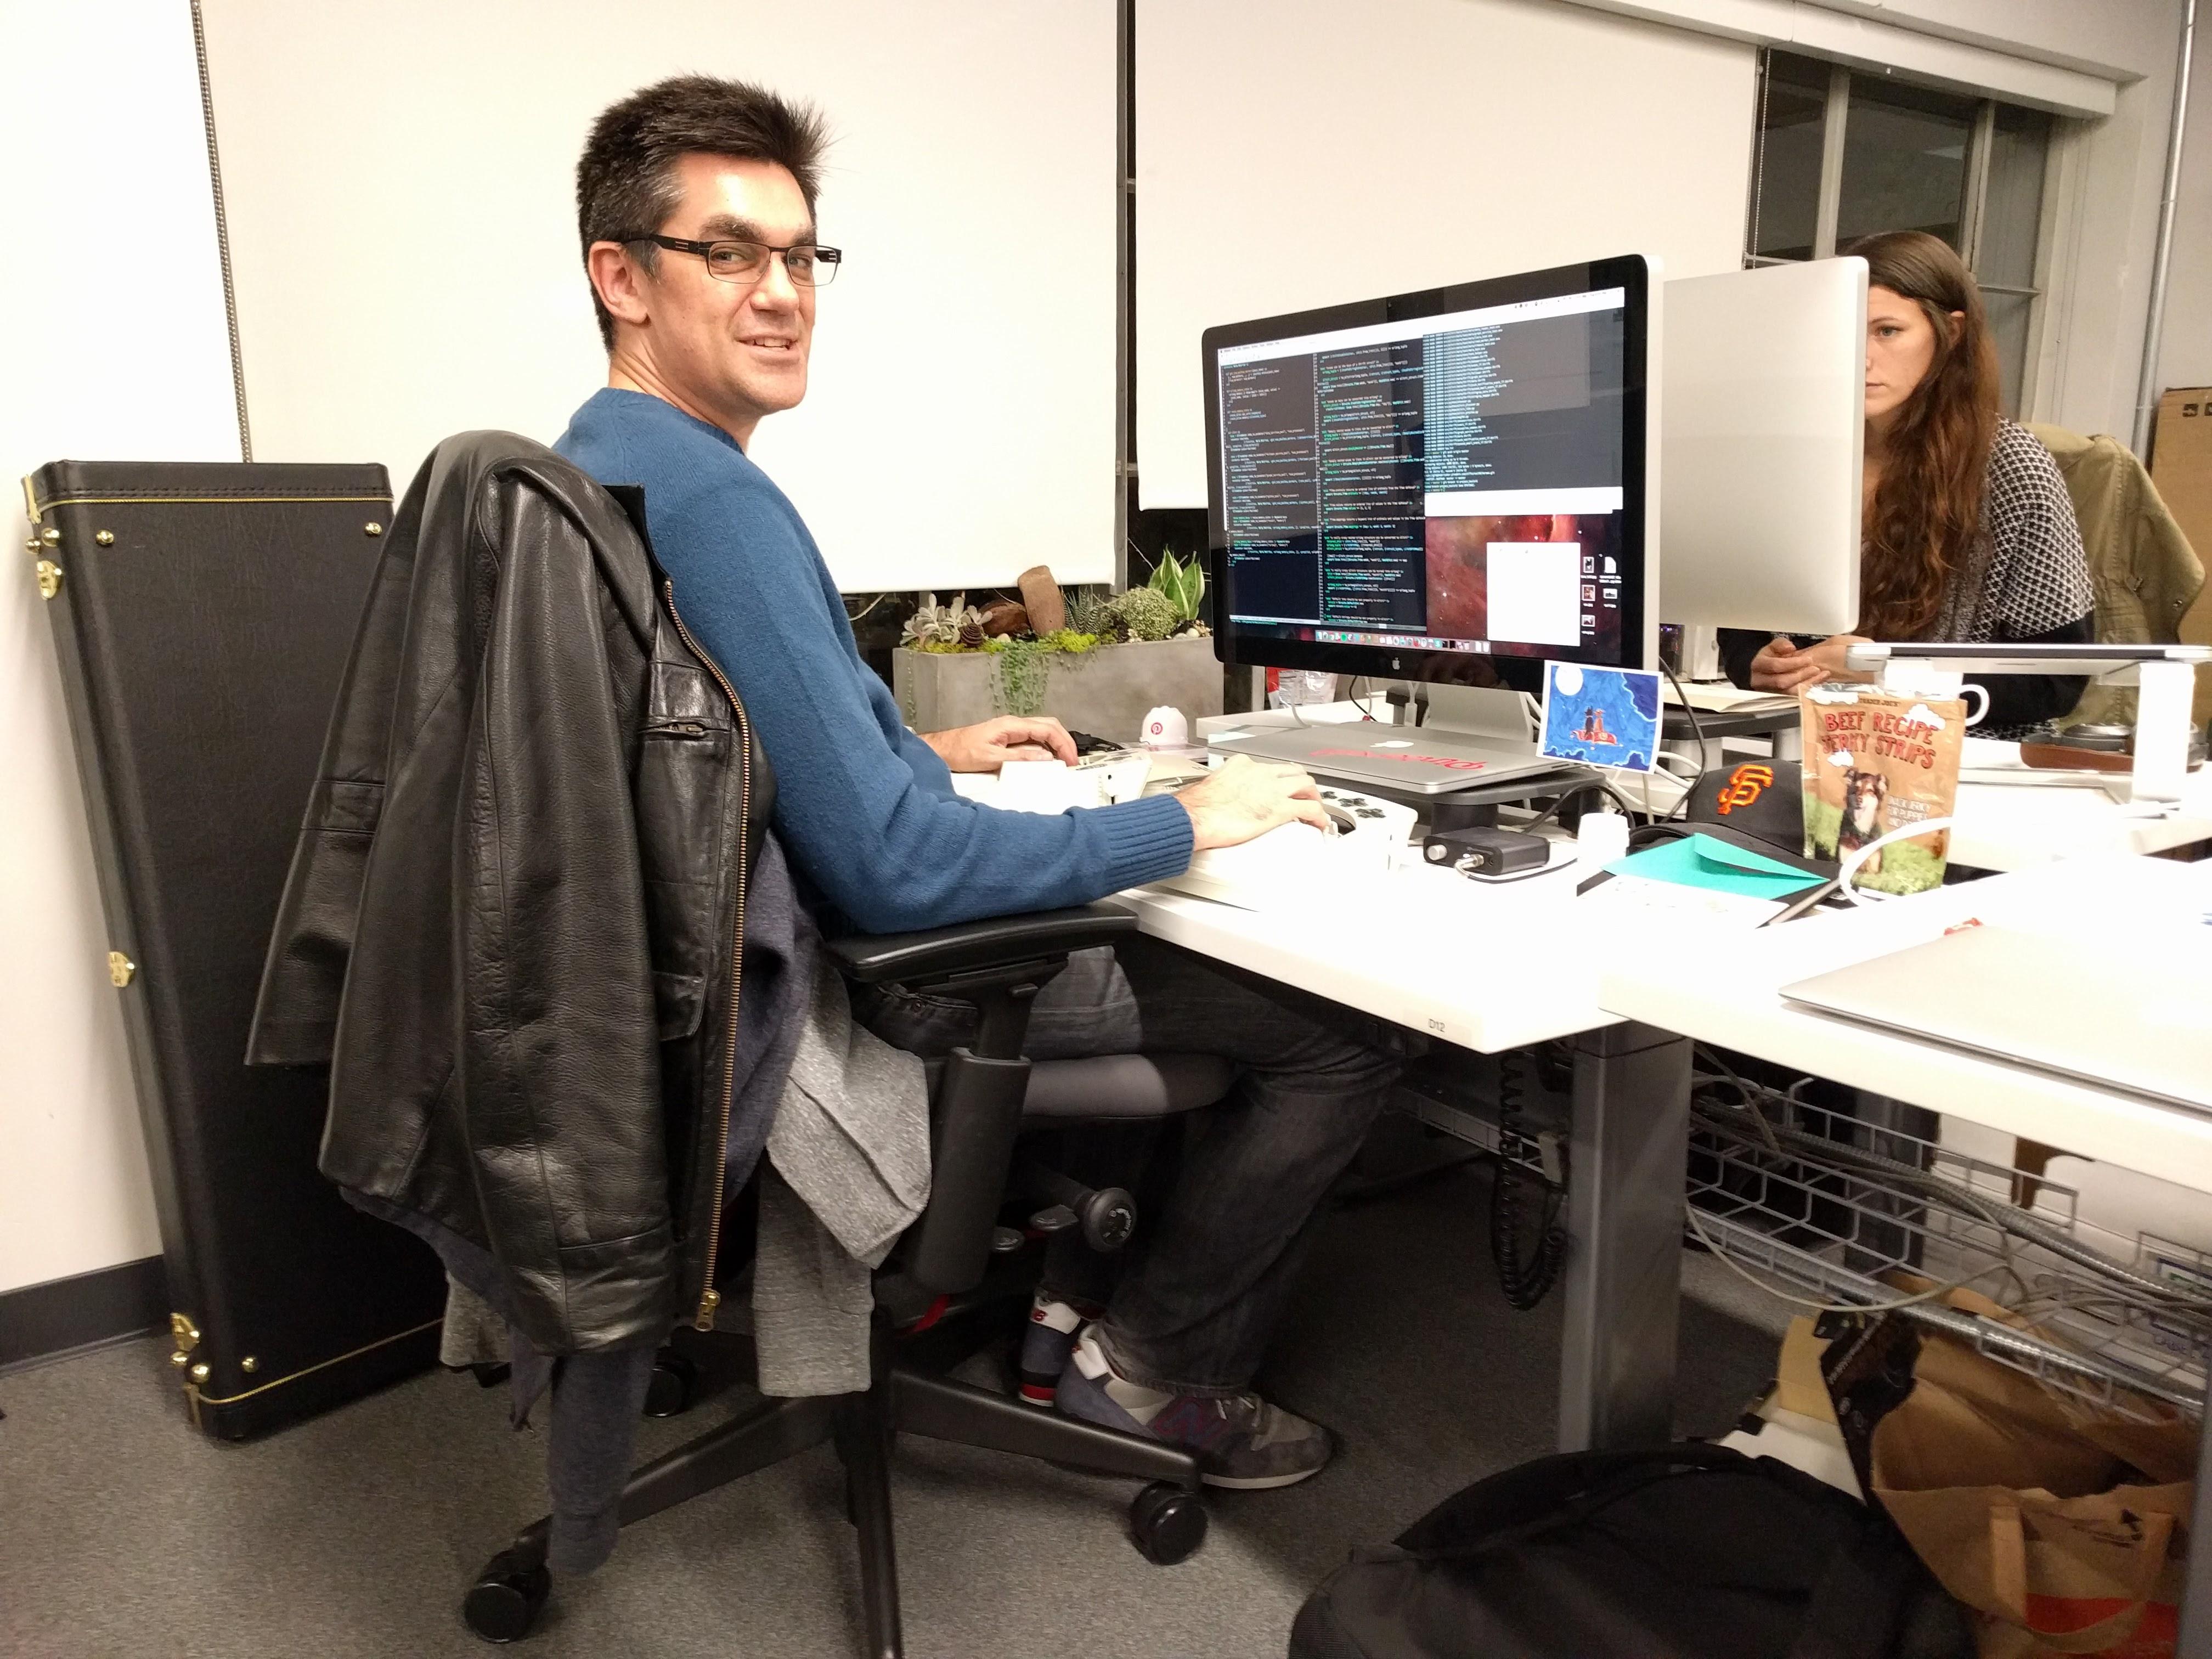 Pinterest product platform software engineer Steve Cohen. Yes, that's Elixir in his Emacs window.